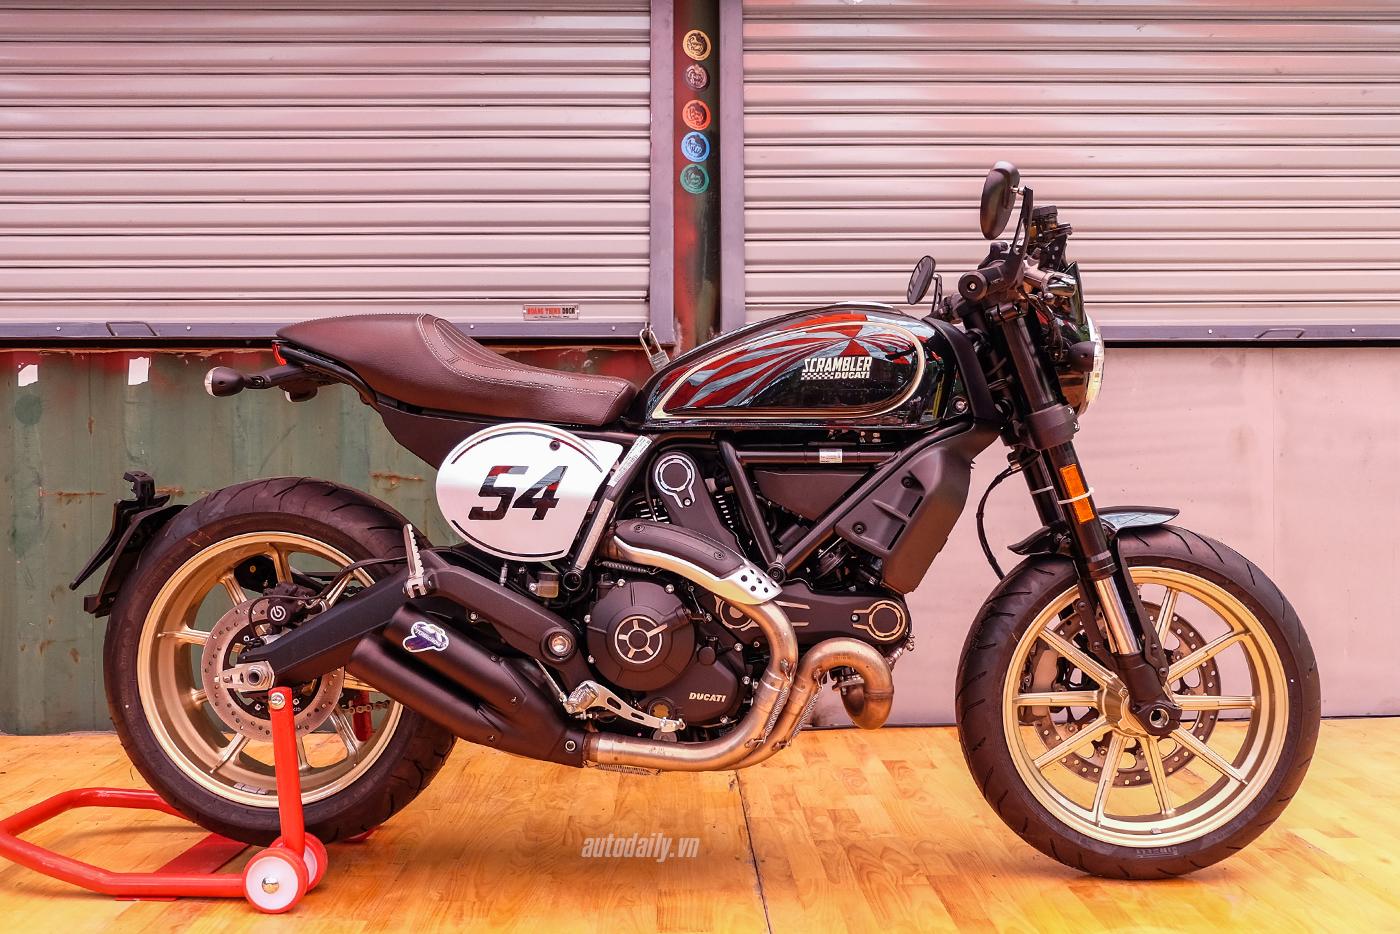 ducati-scrambler-cafe-racer-3.jpg